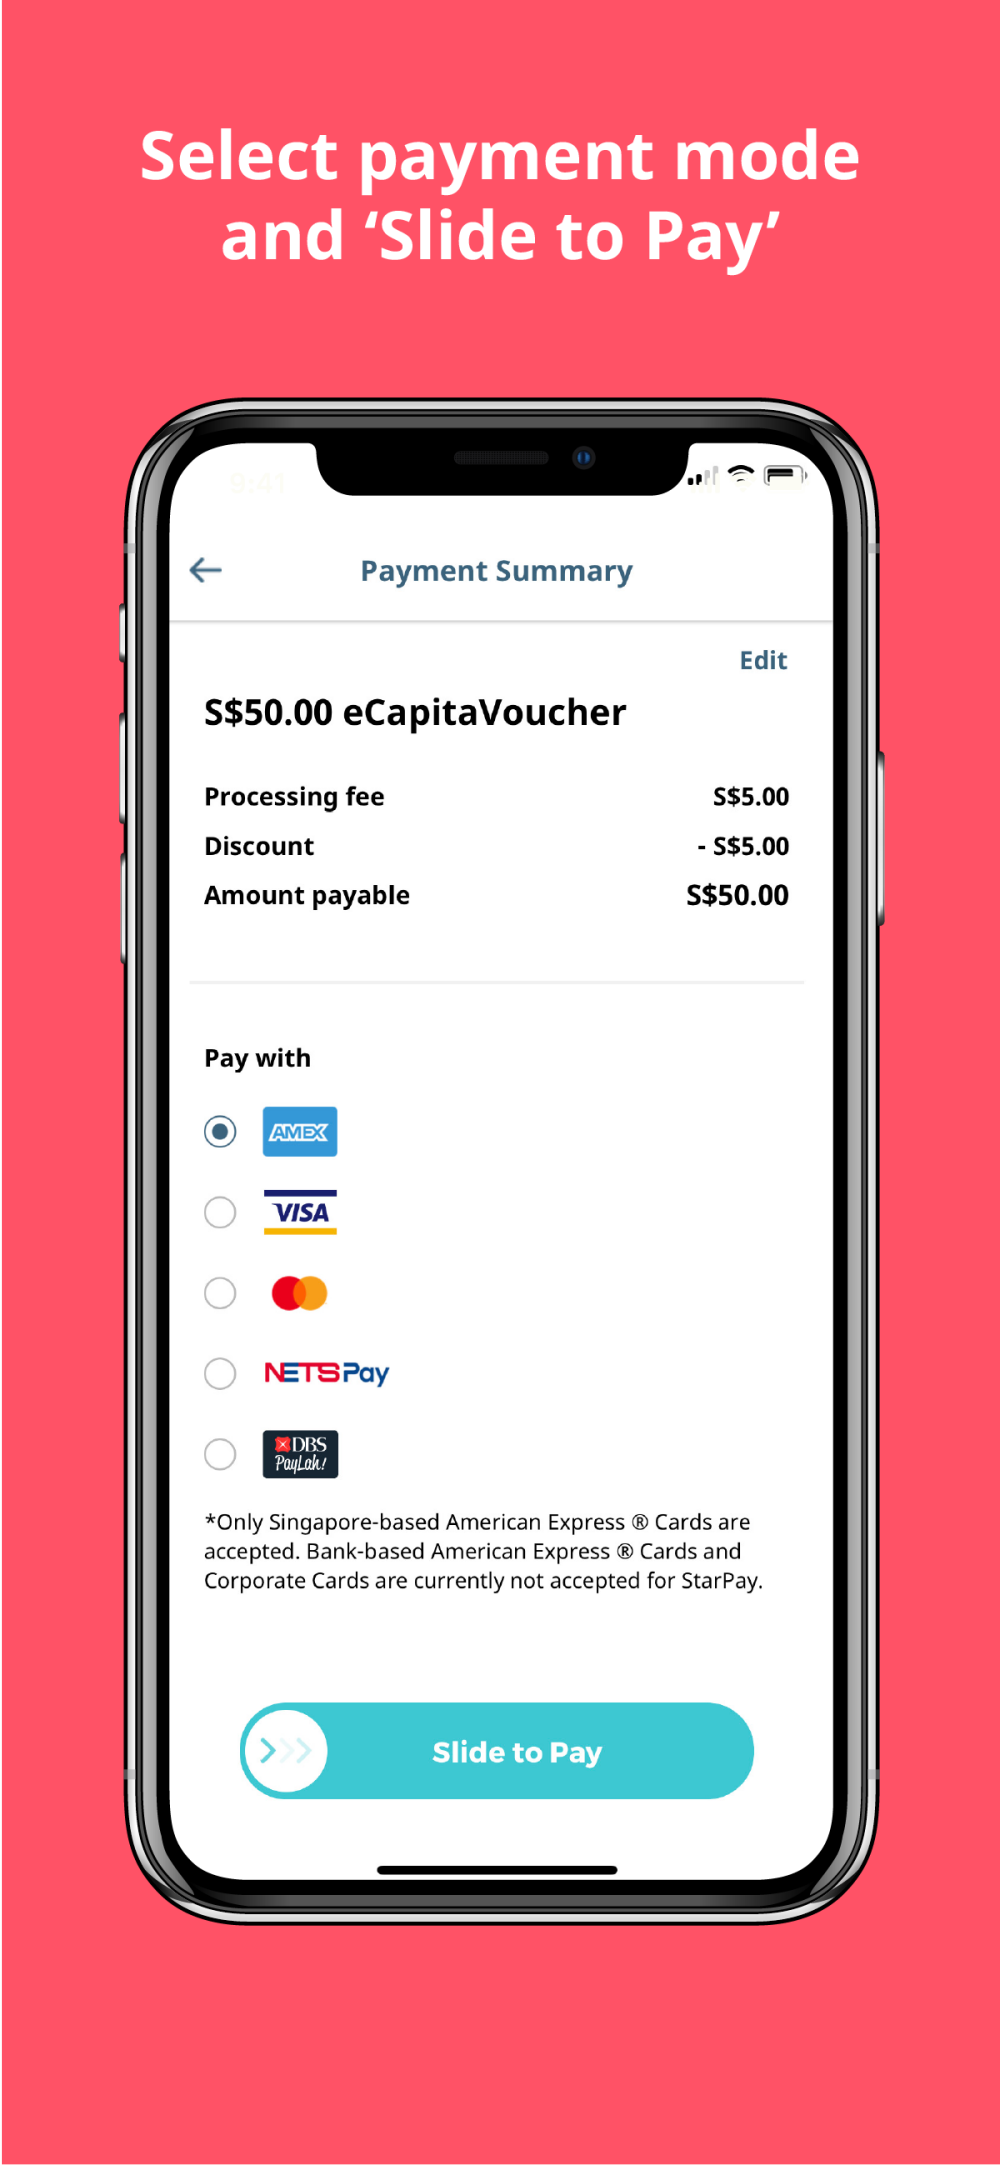 About eCapitaVoucher | CapitaStar